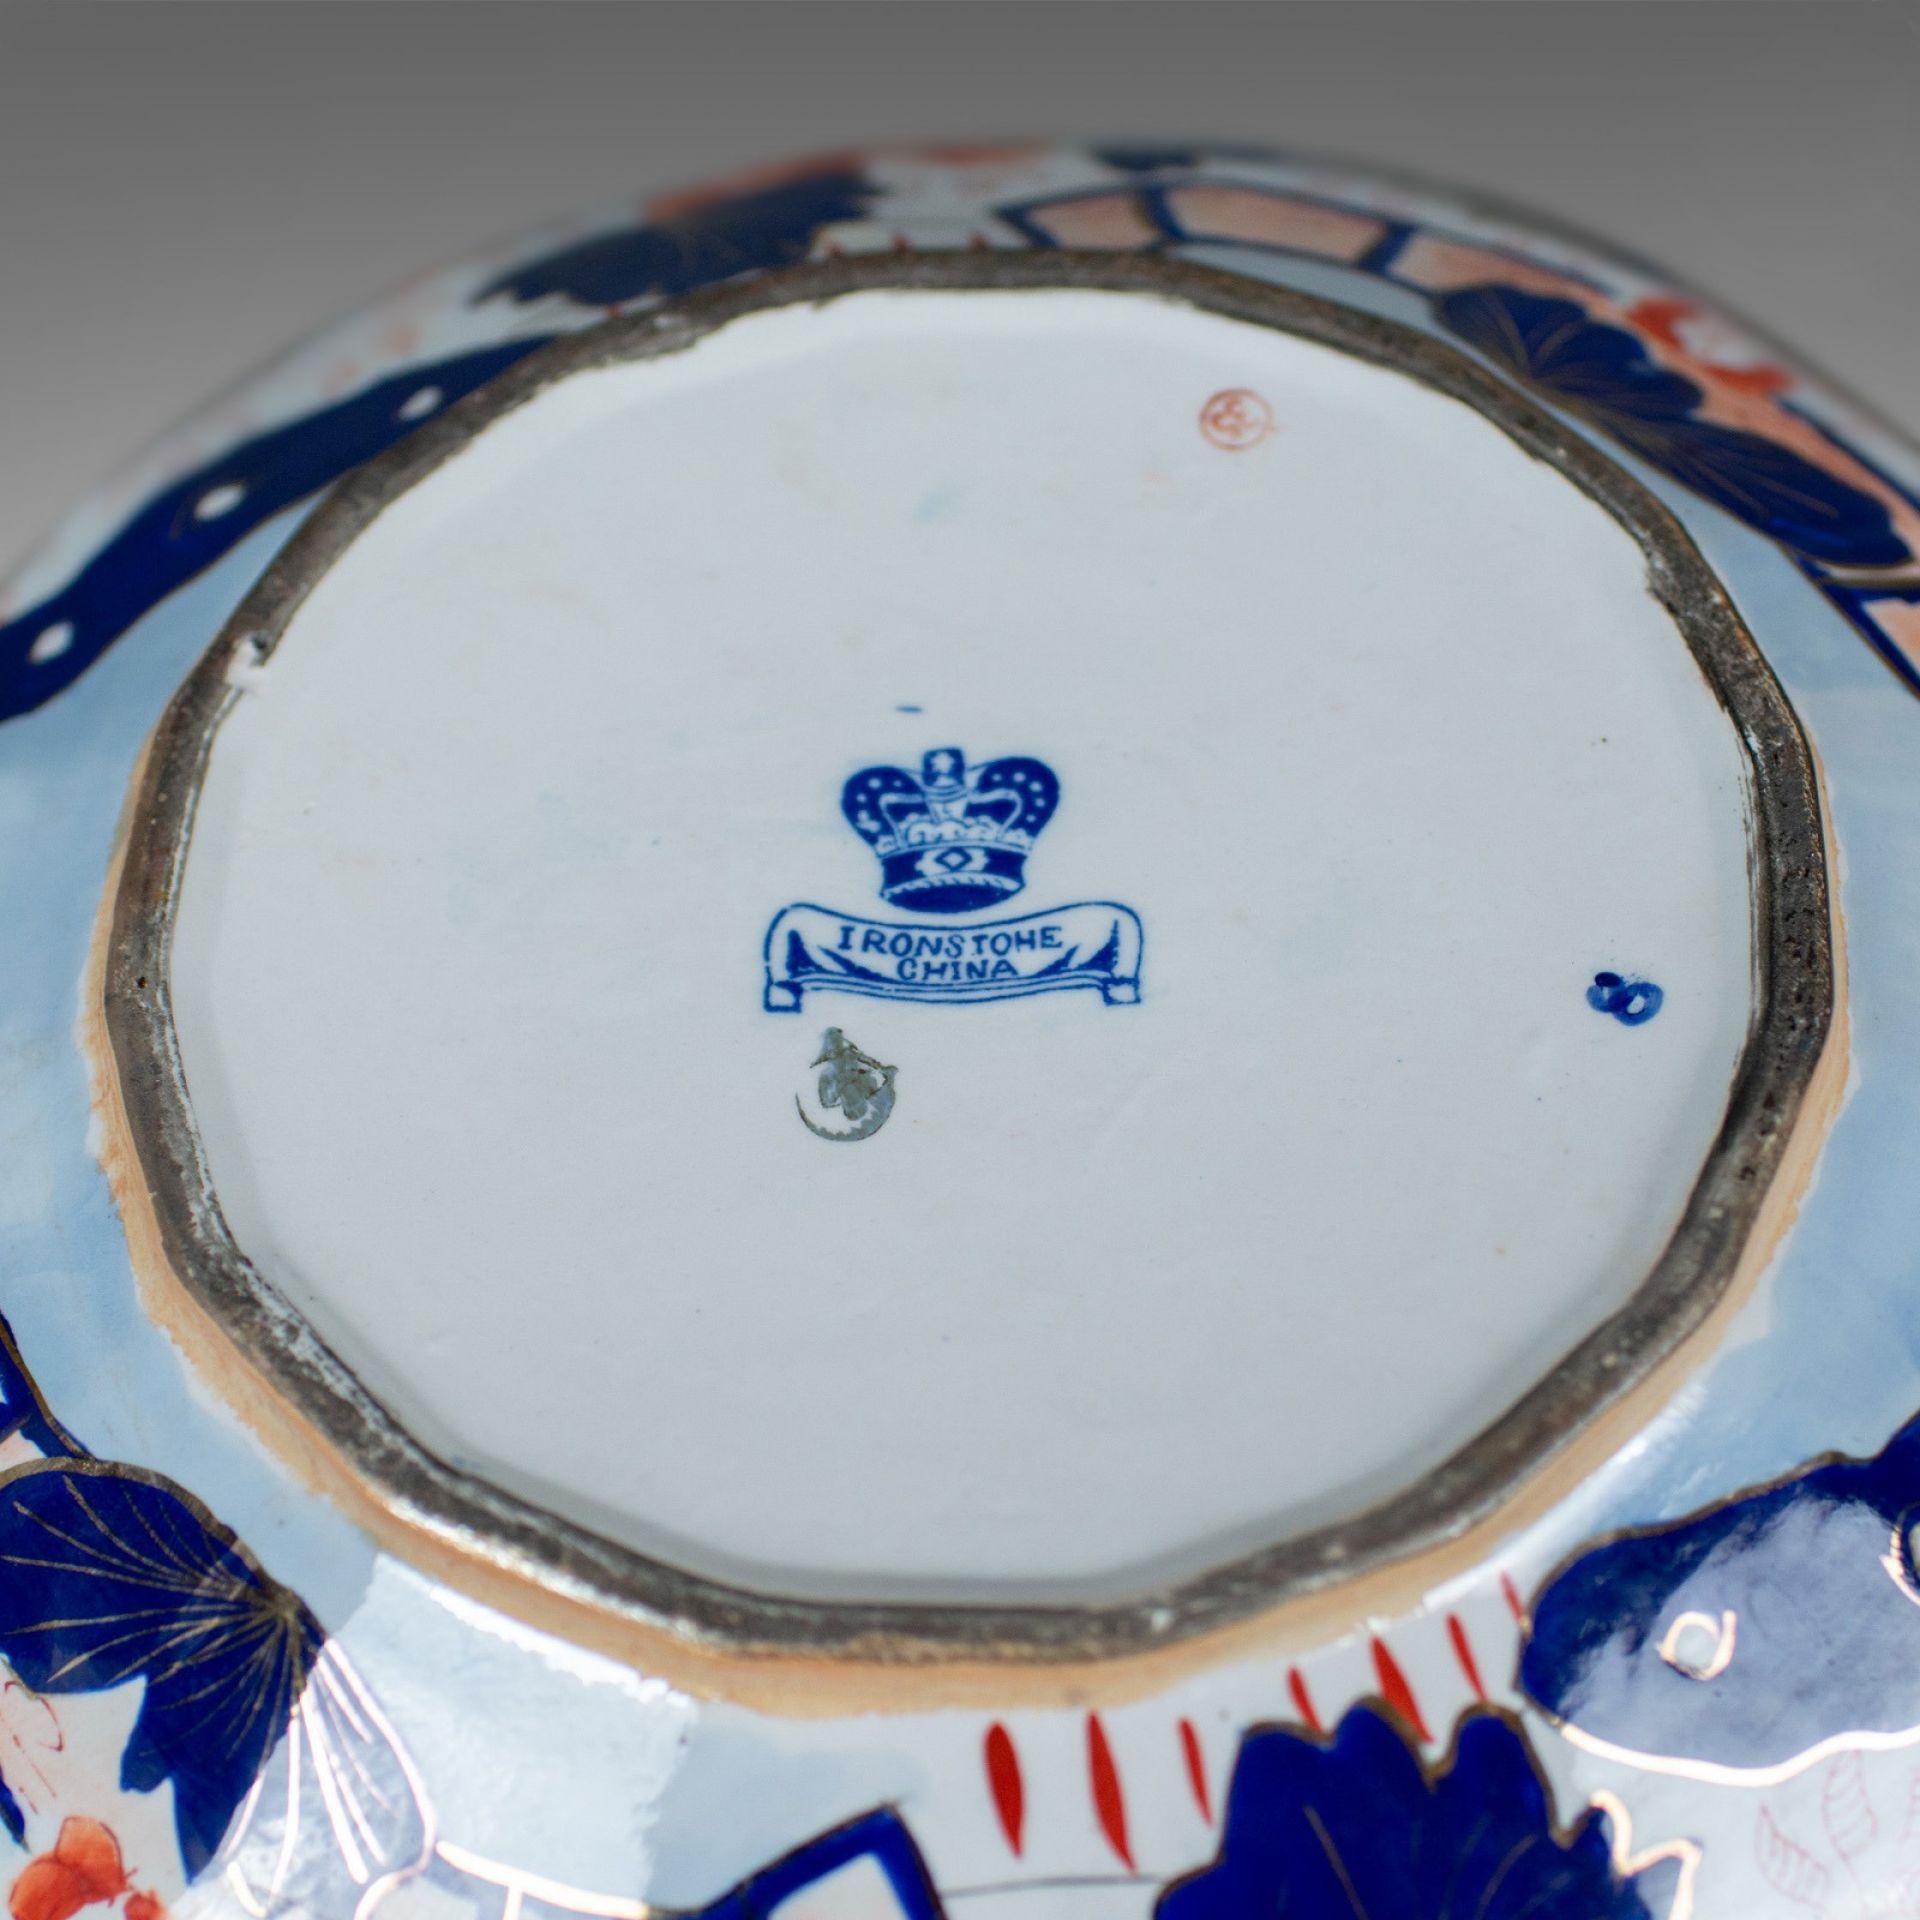 Vintage Ironstone China Ewer and Basin, Jug and Bowl, Victorian Taste, Mid C20th